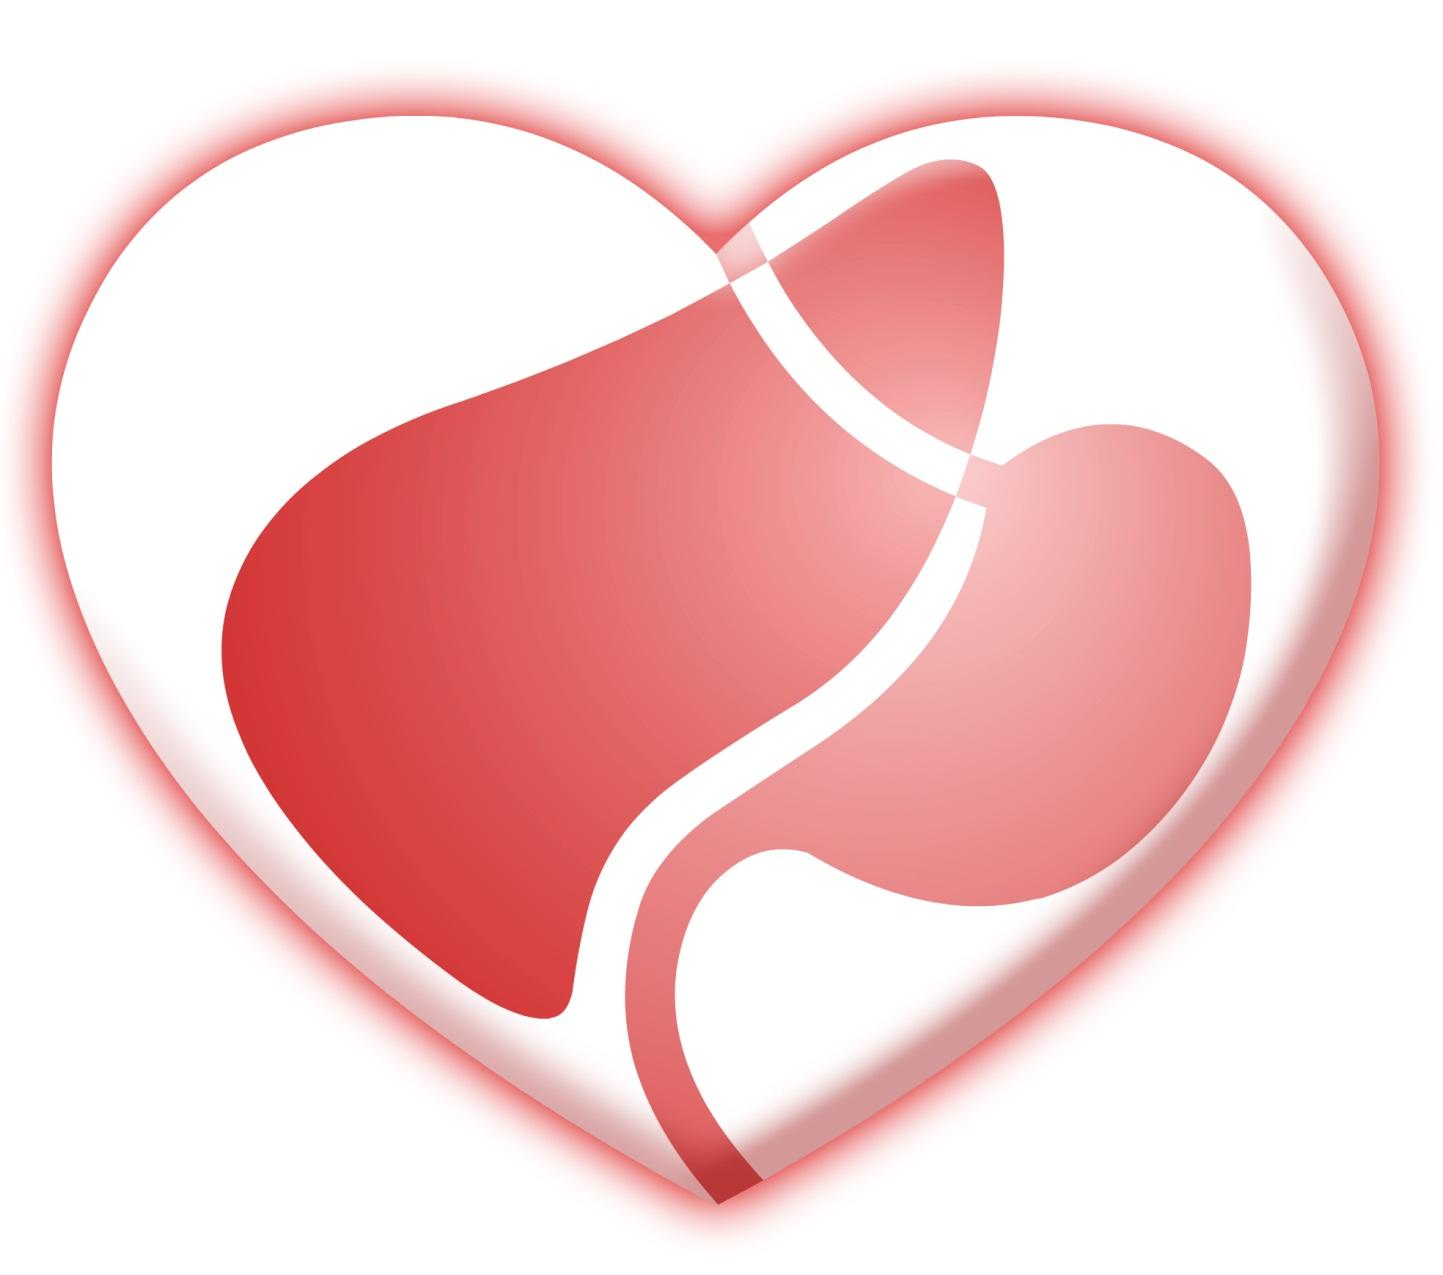 Desmond Wai Liver and Gastrointestinal Diseses Centre